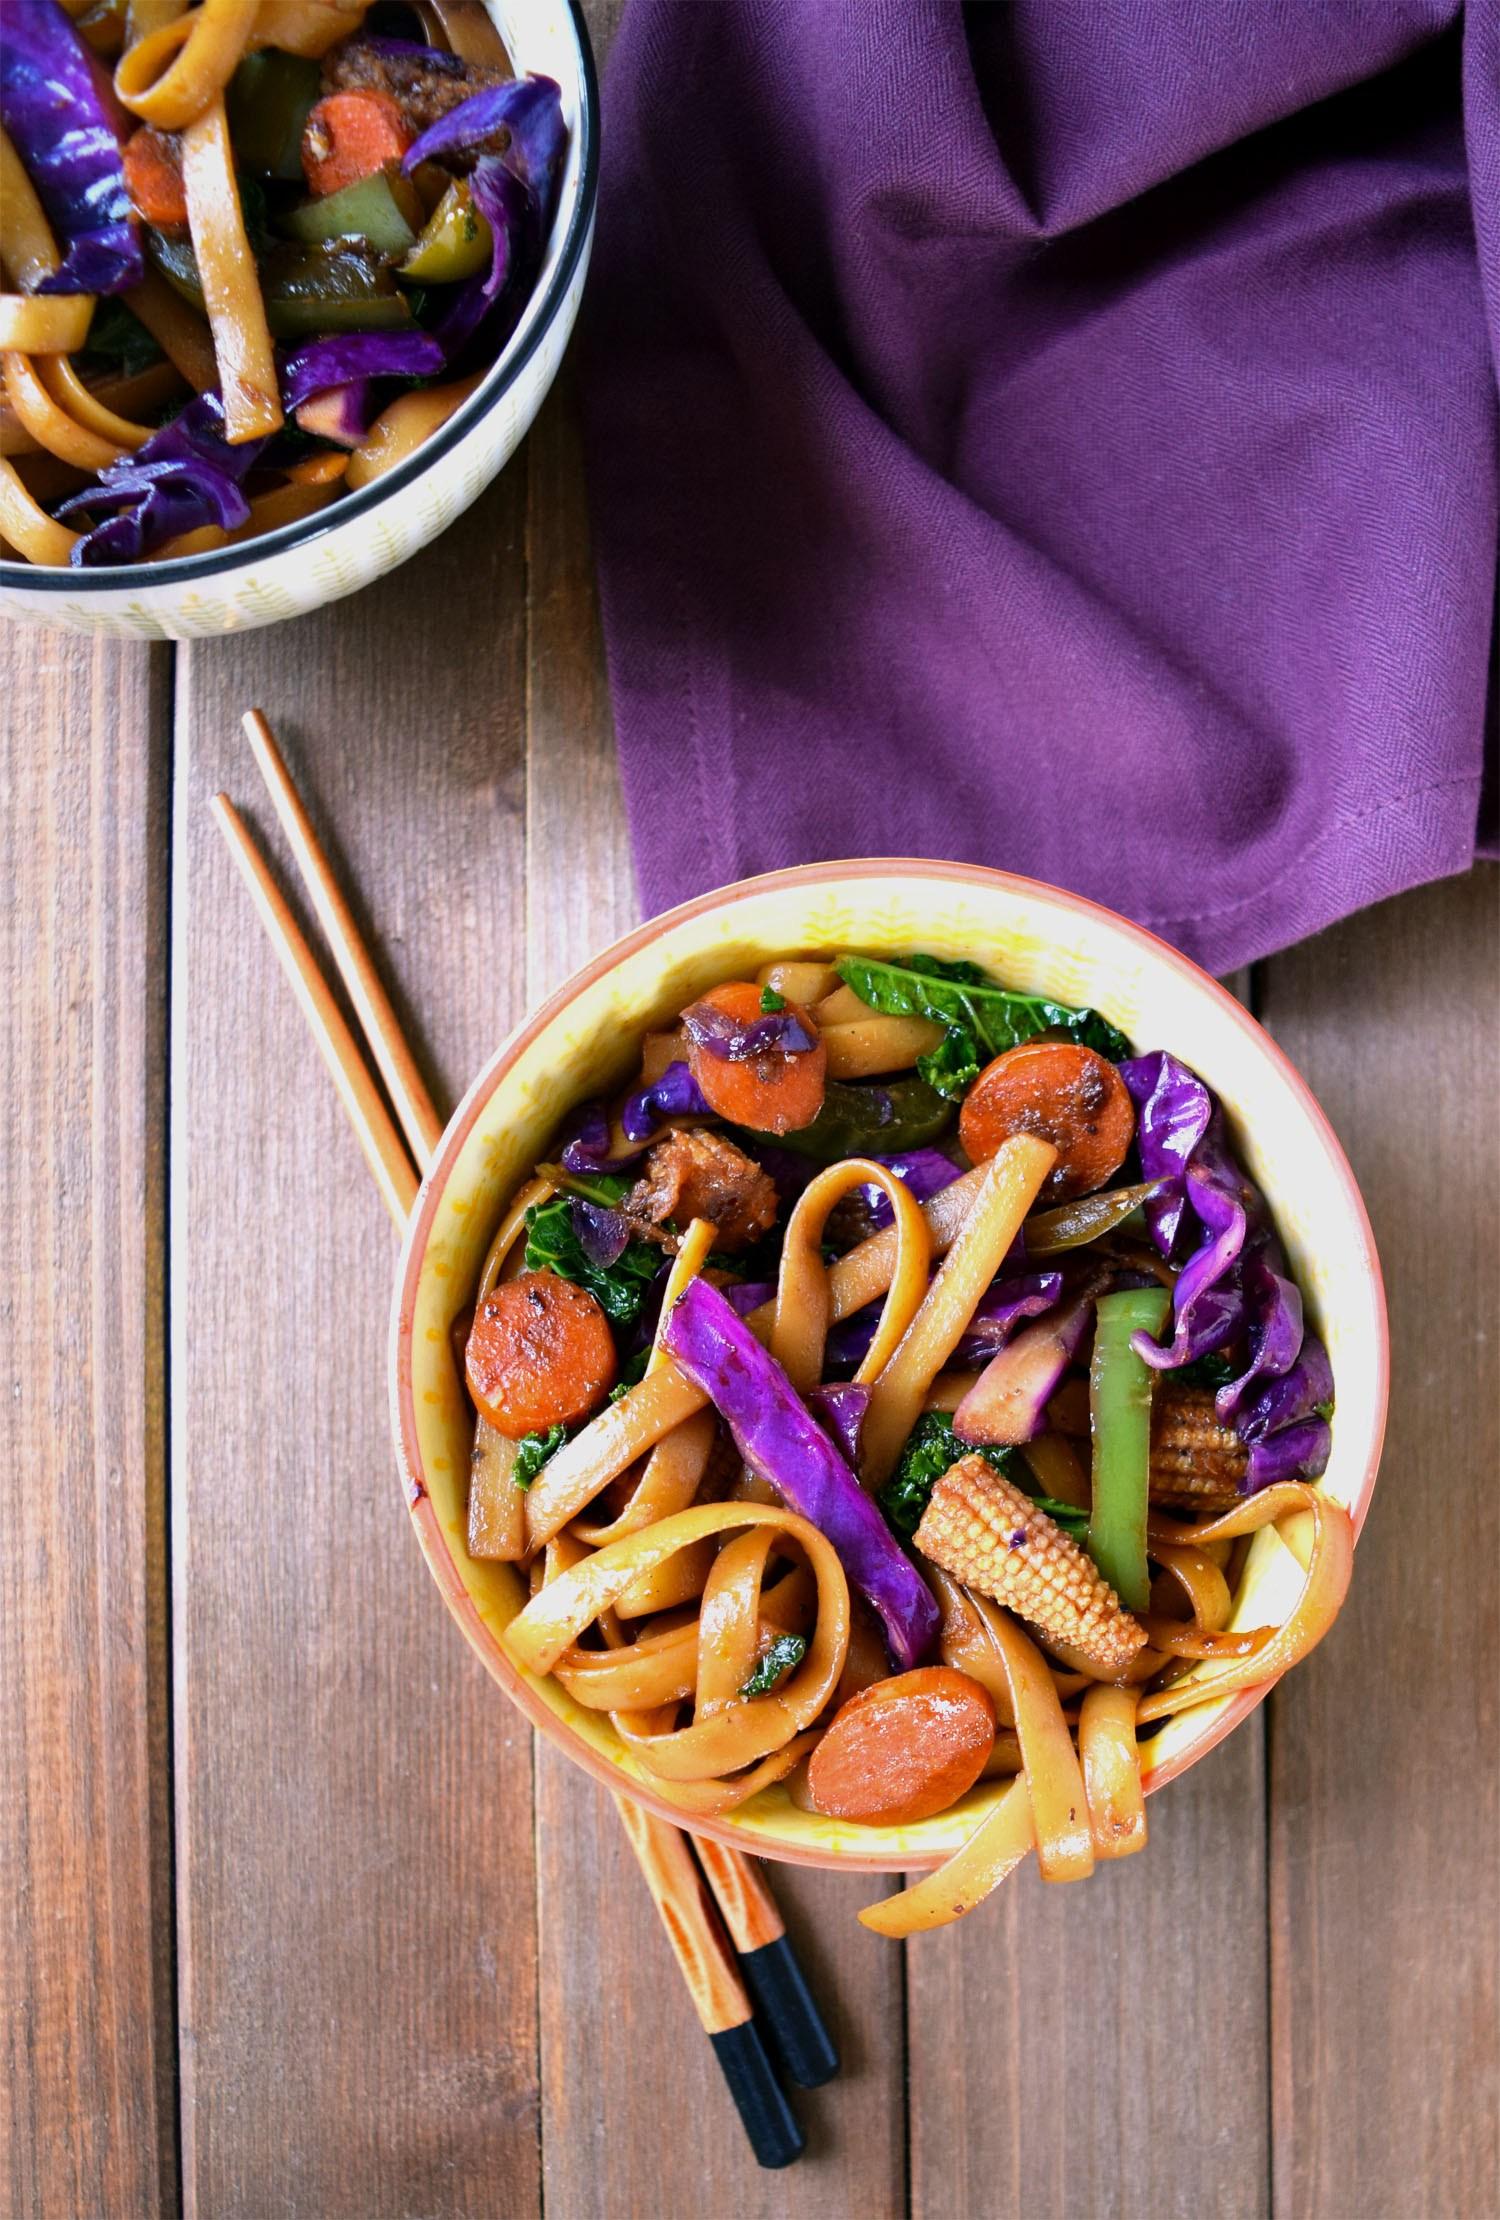 Vegan Mongolian Stir-fry